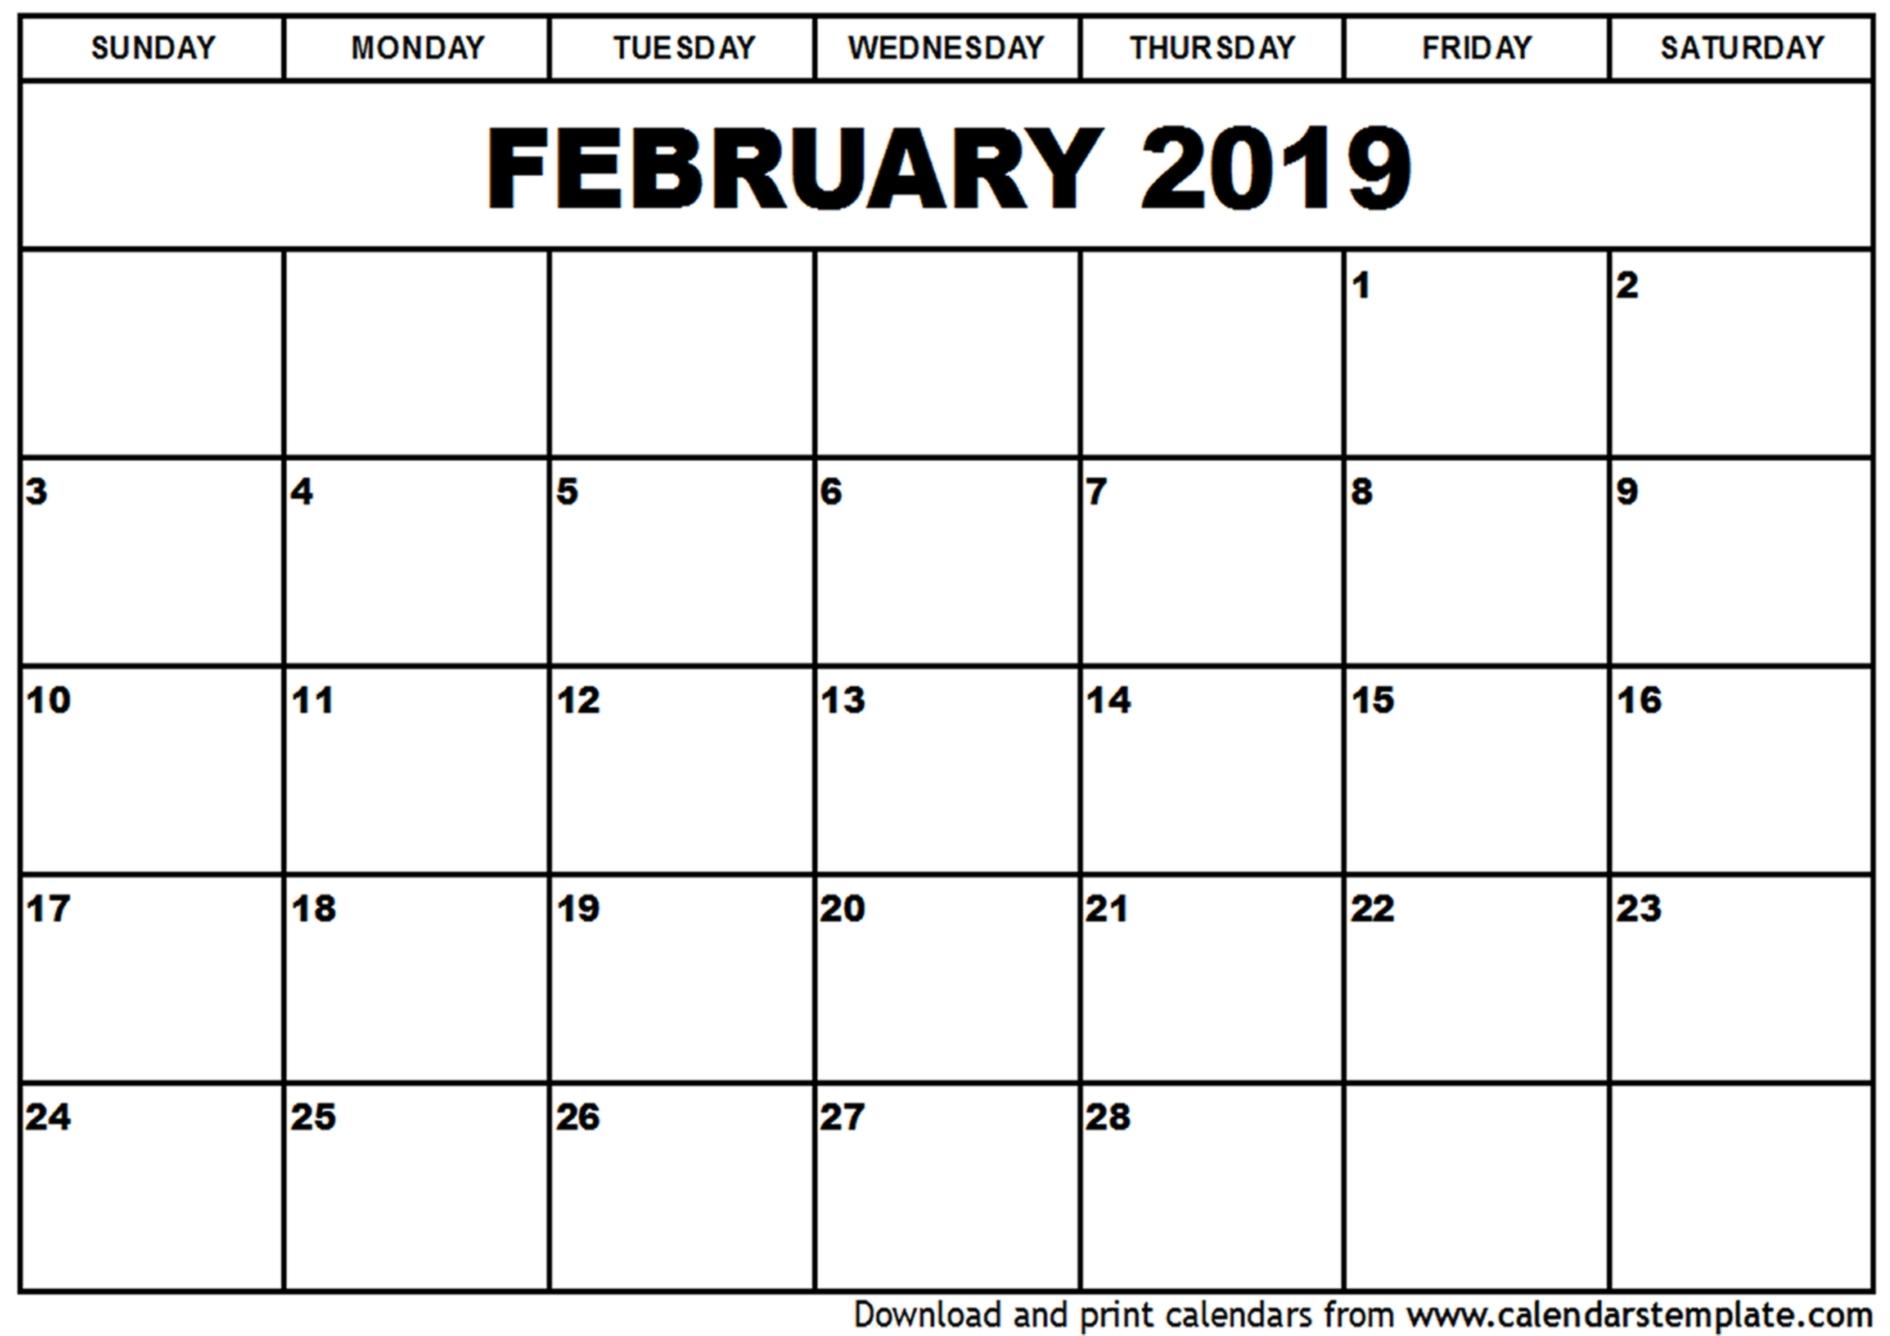 February 2019 Calendar Pdf | Year Printable Calendar for Print Blank Calendar Month By Month